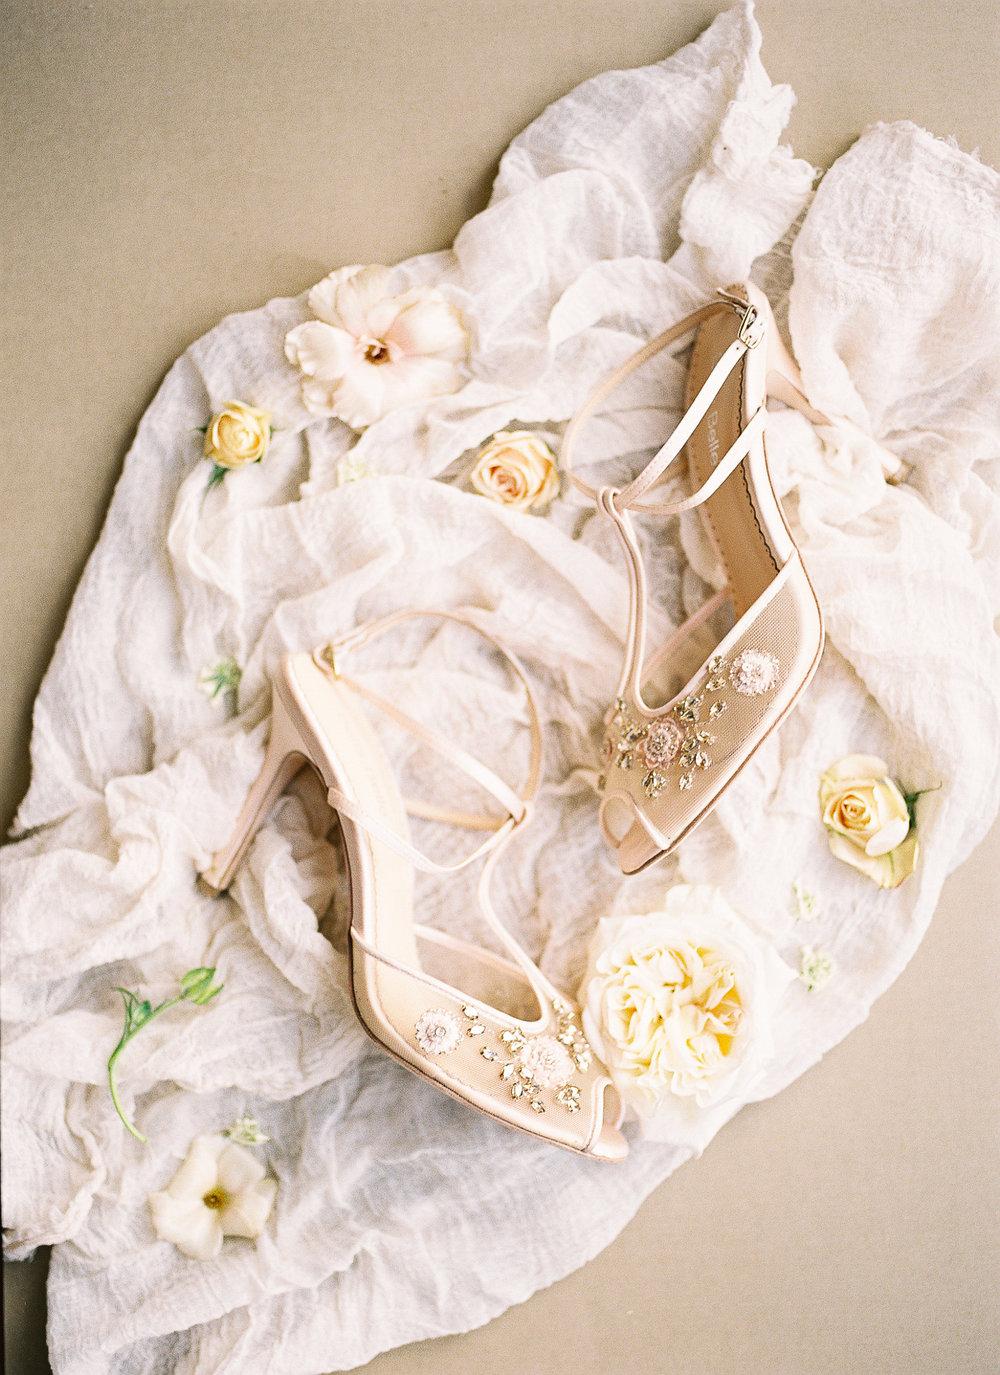 Glenview Mansion Wedding Venue  Lisamarieartistry.com (14 of 39).JPG